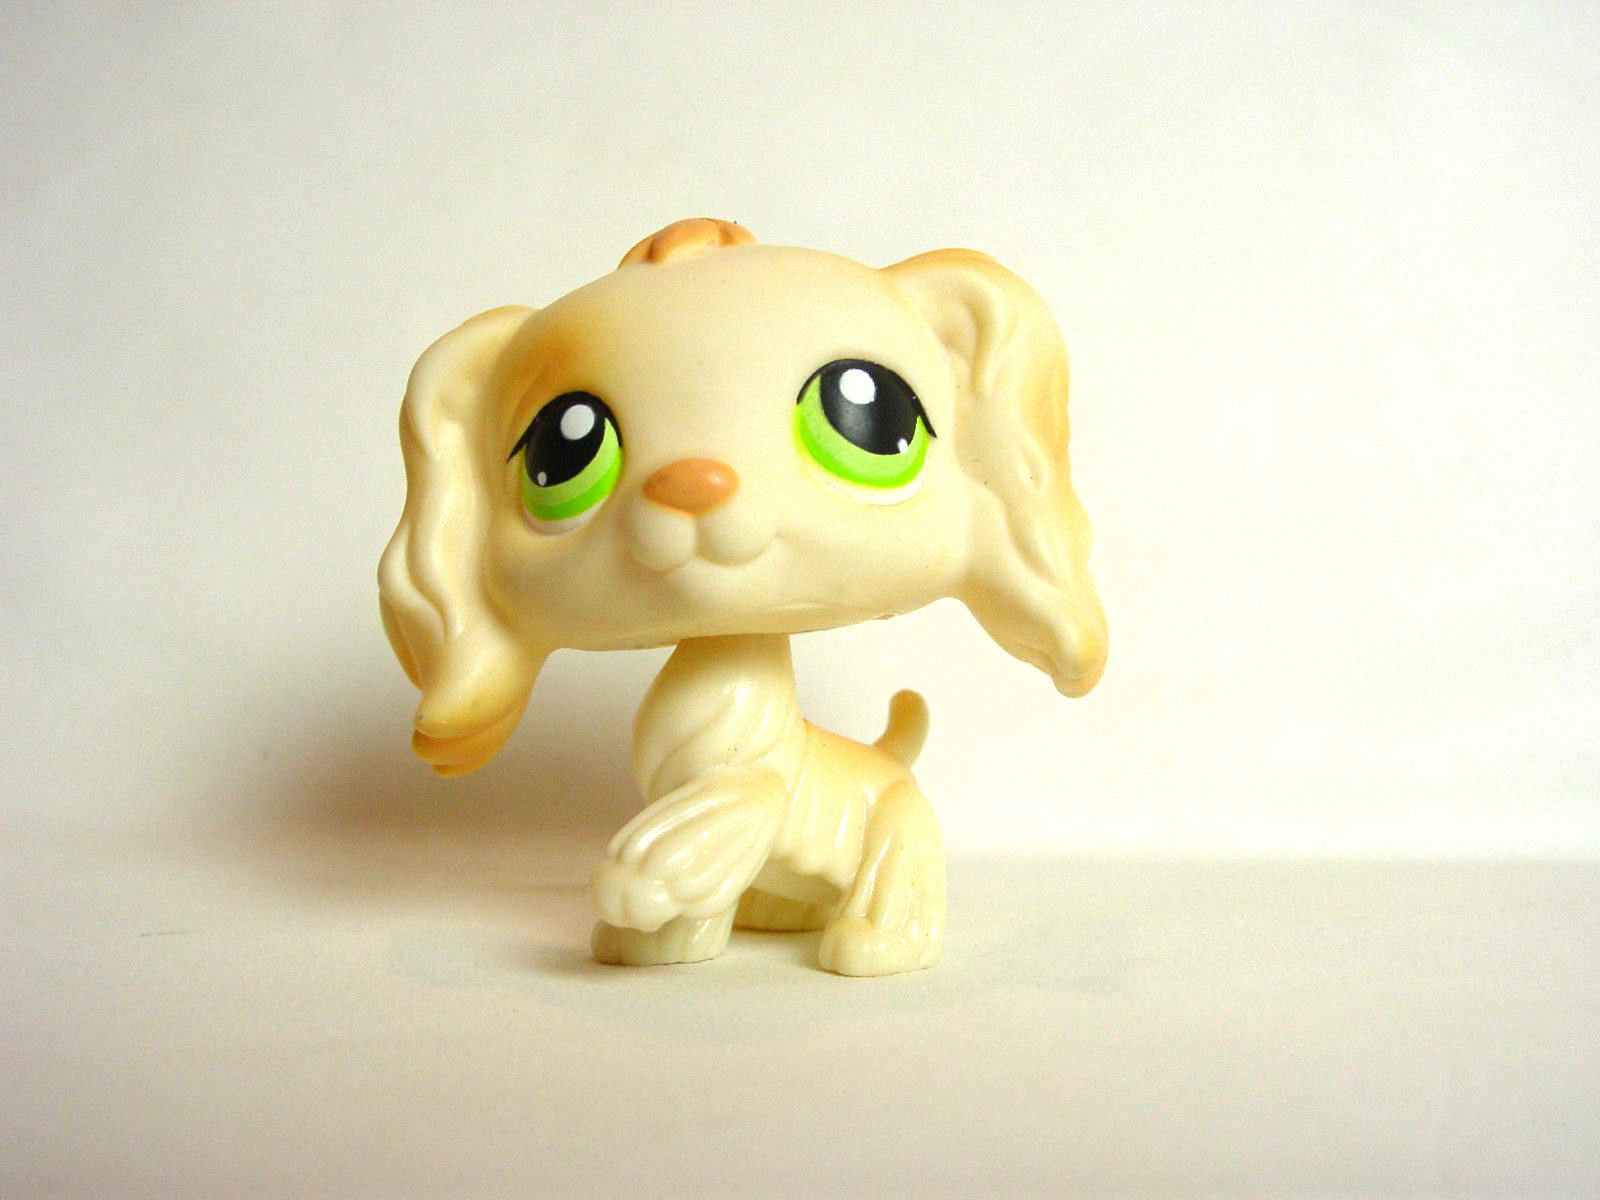 Littlest Pet Shop Dog Cocker Spaniel 347 Beige Tan Green Eyes Puppy